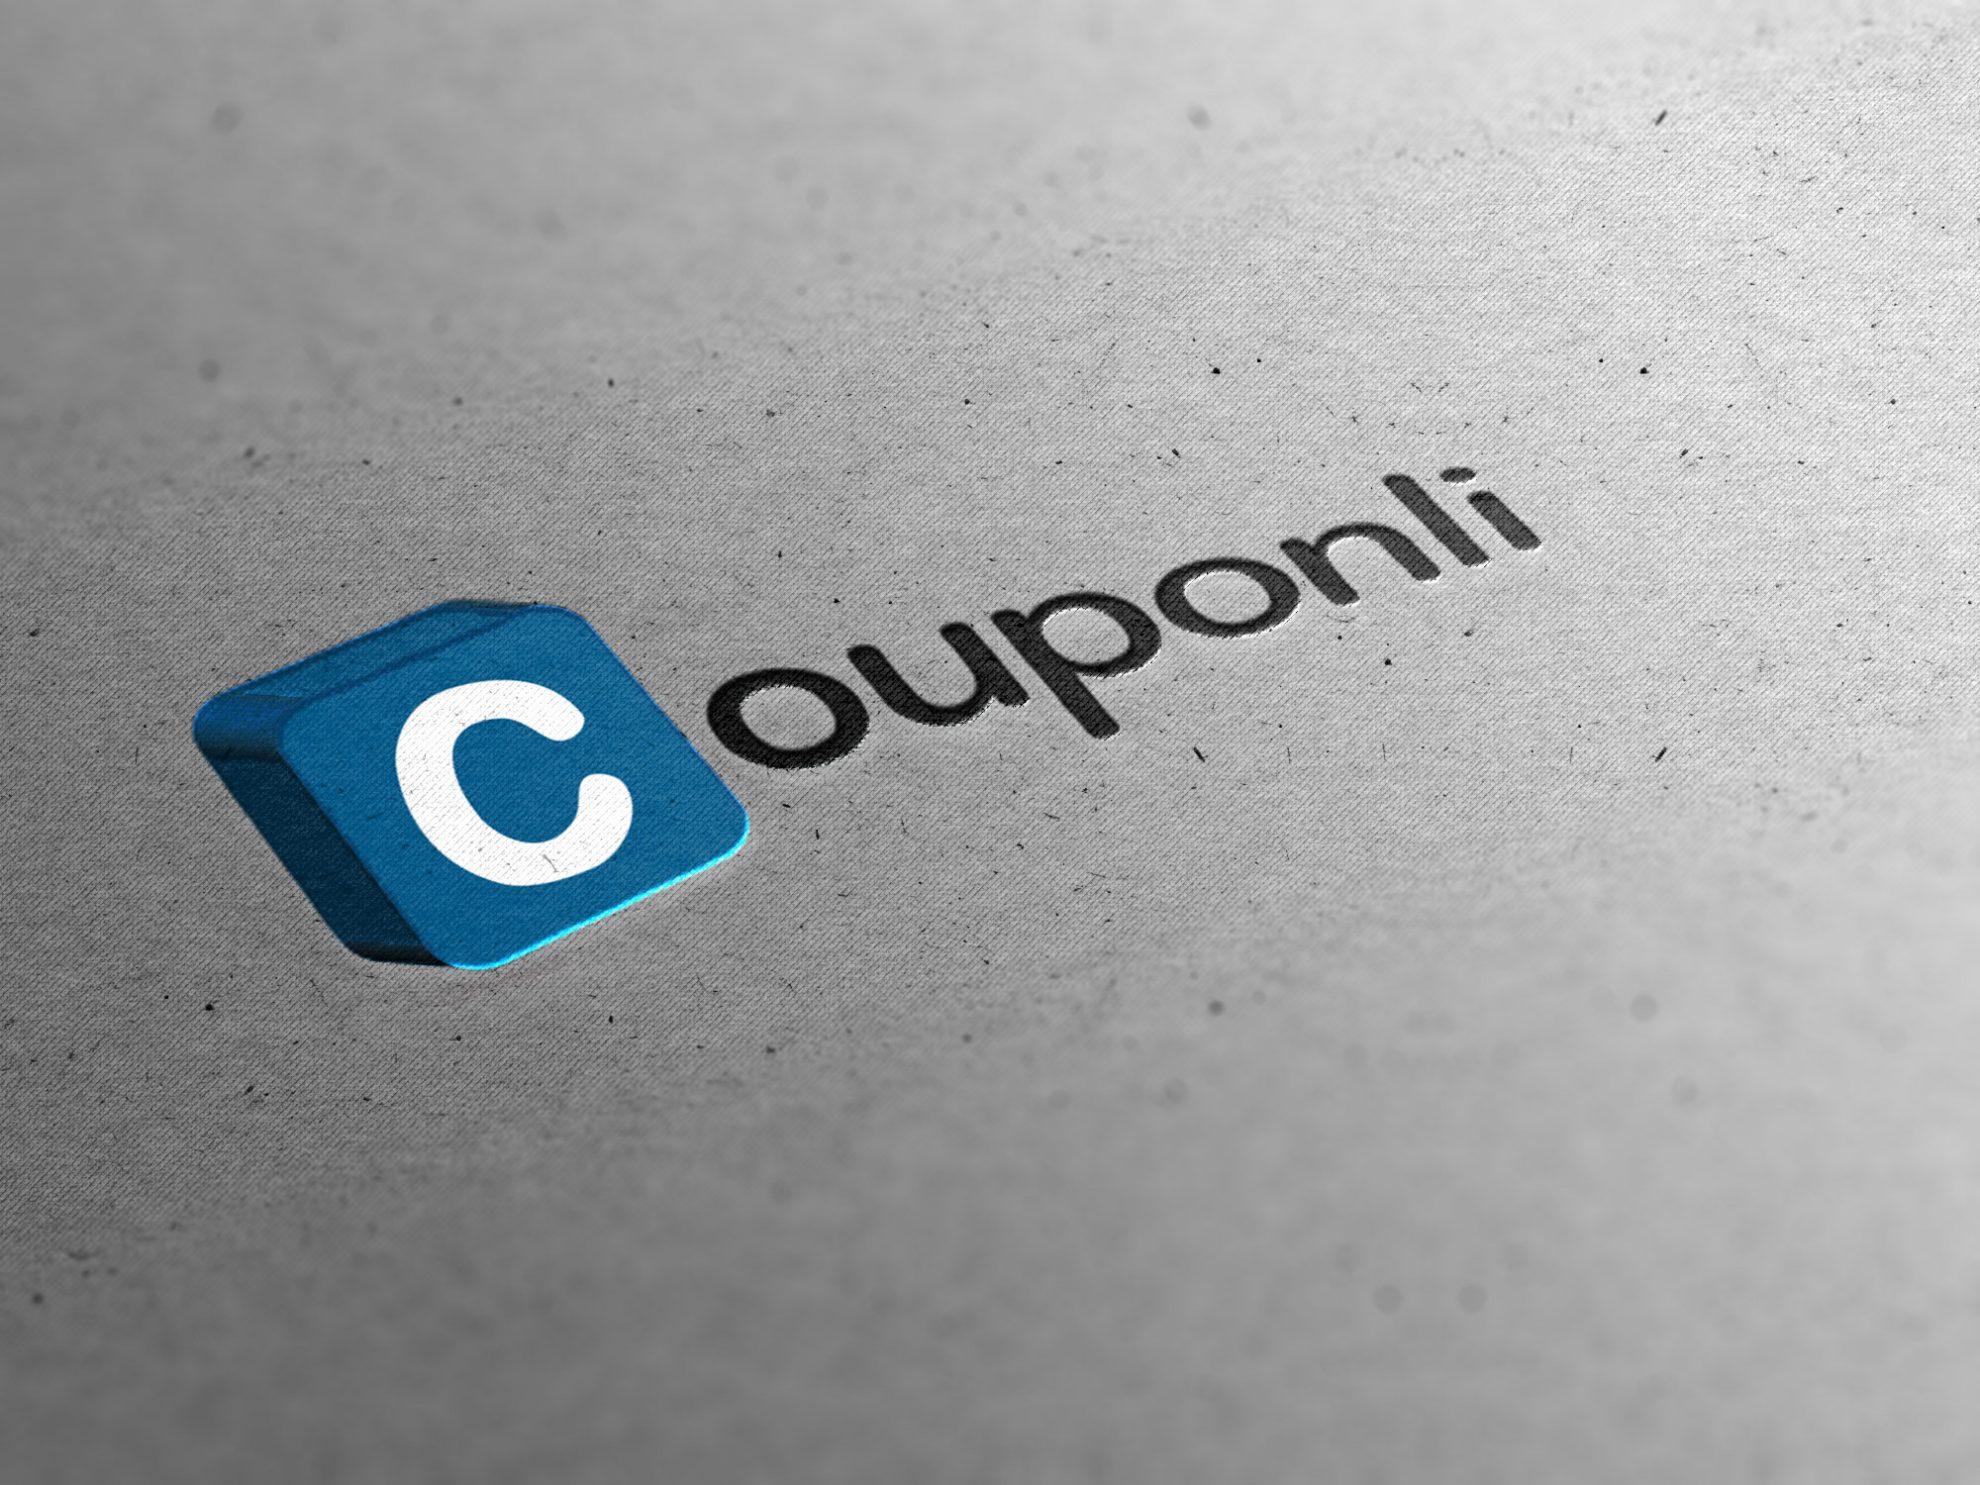 logo-mockup-ALL-LOGOS-Copunli